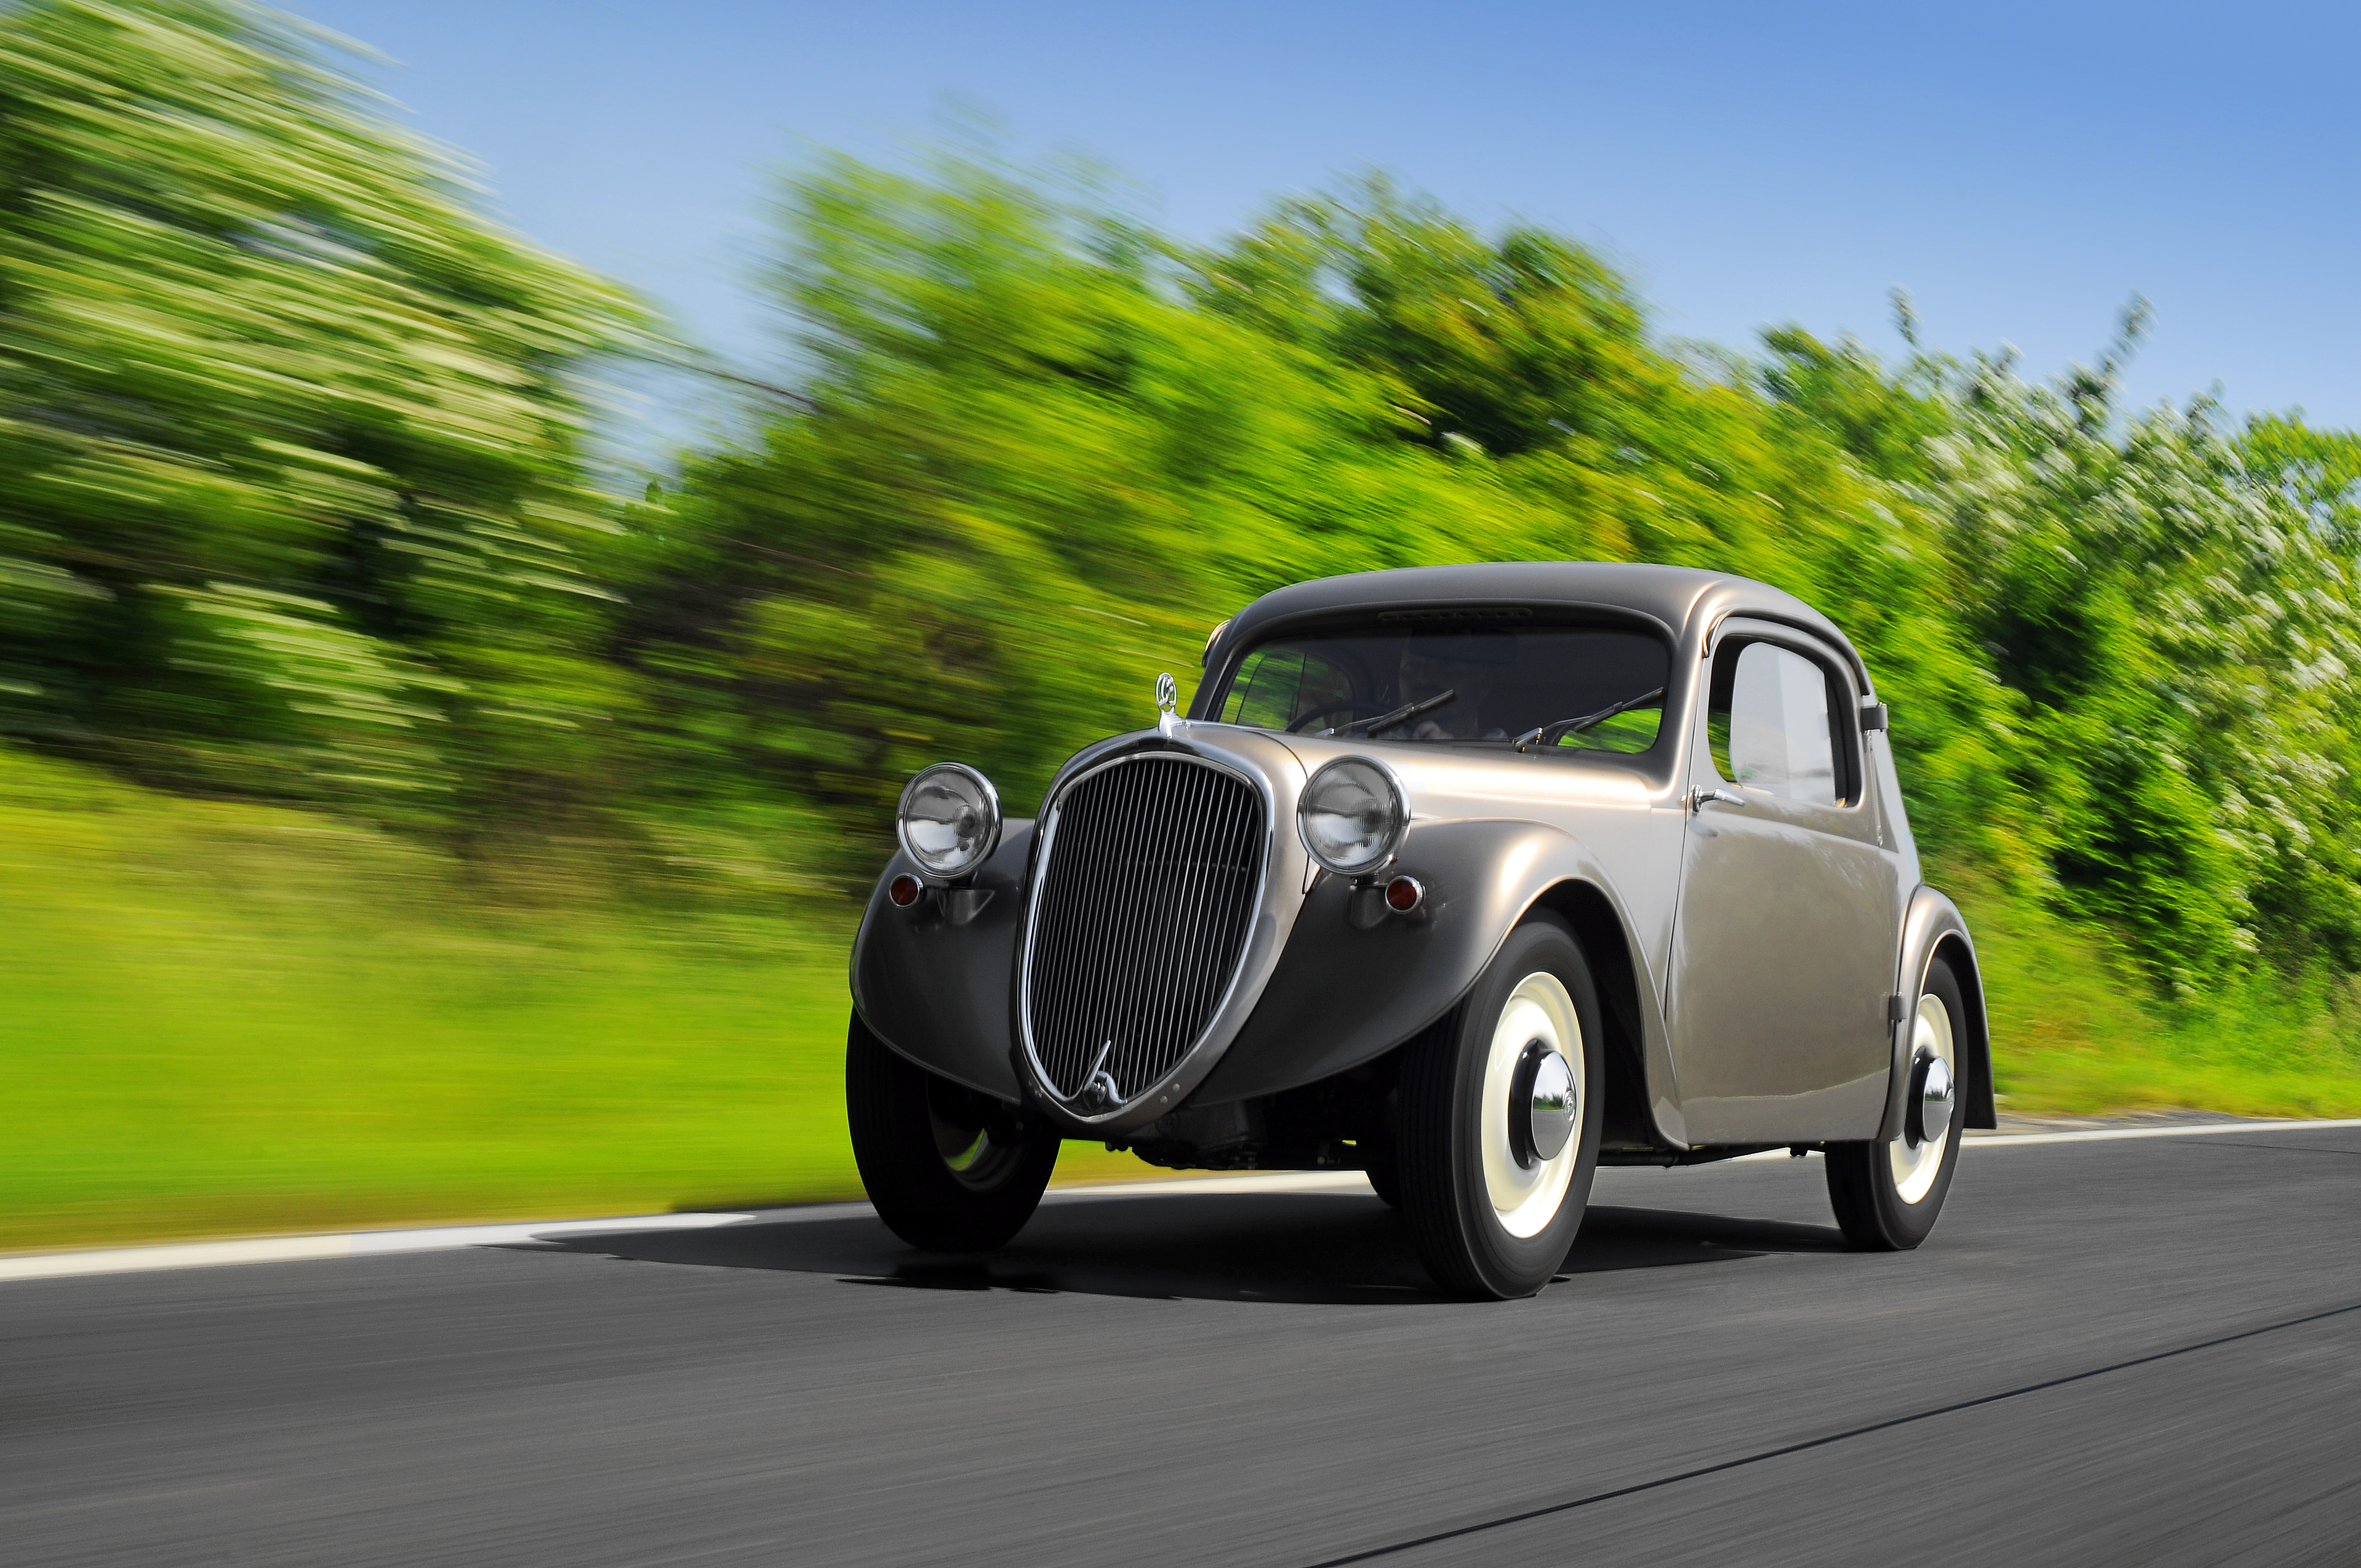 Lesser-known models from SKODA AUTO's 125-year history: The SKODA SAGITTA - Image 4